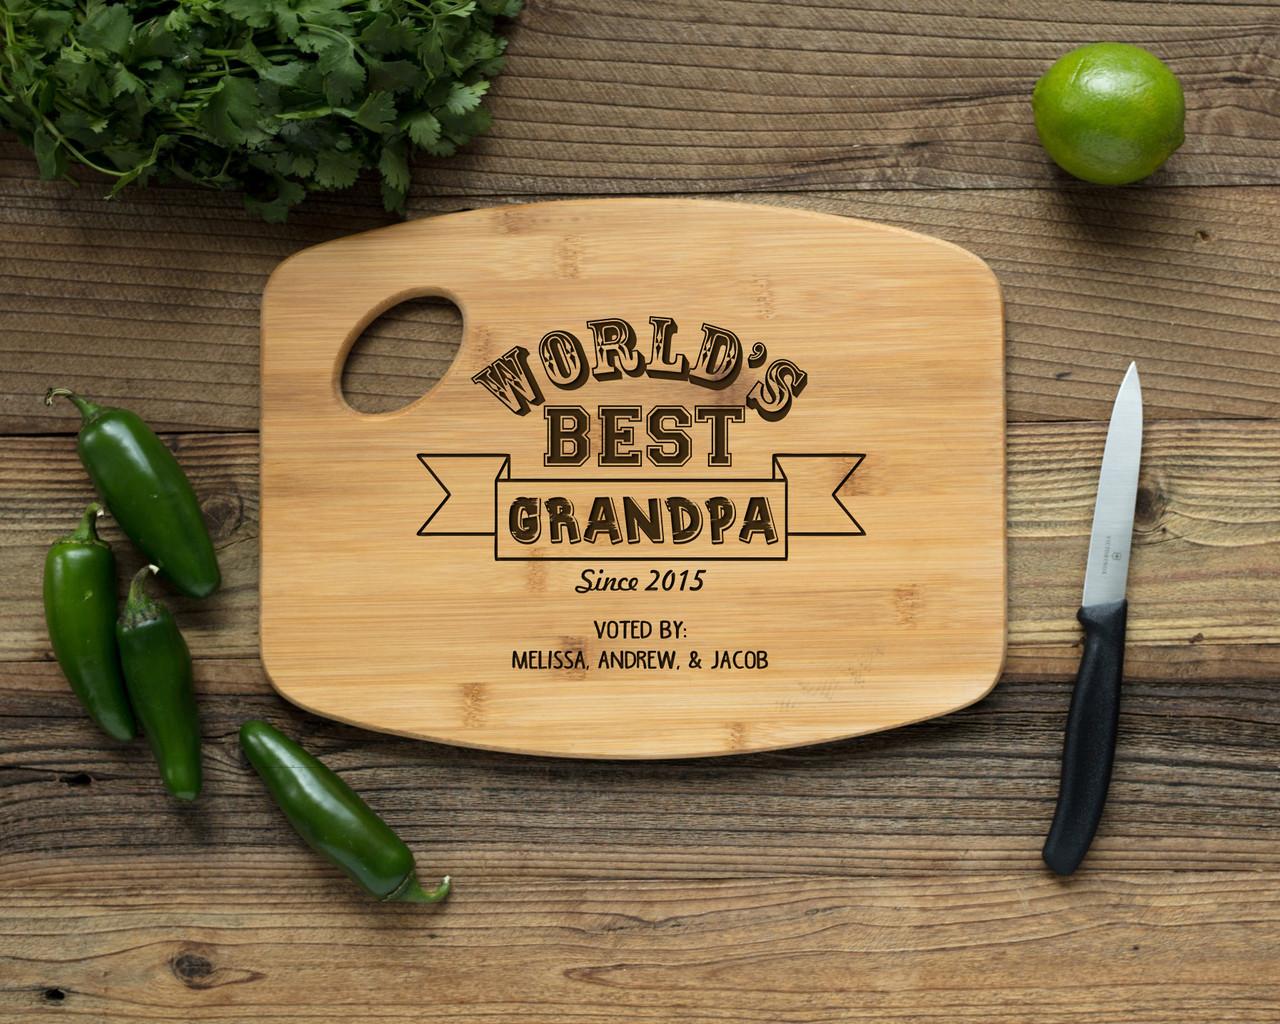 Grpn Spain - Handle Worlds Best Grandpa Personalized Cutting Board